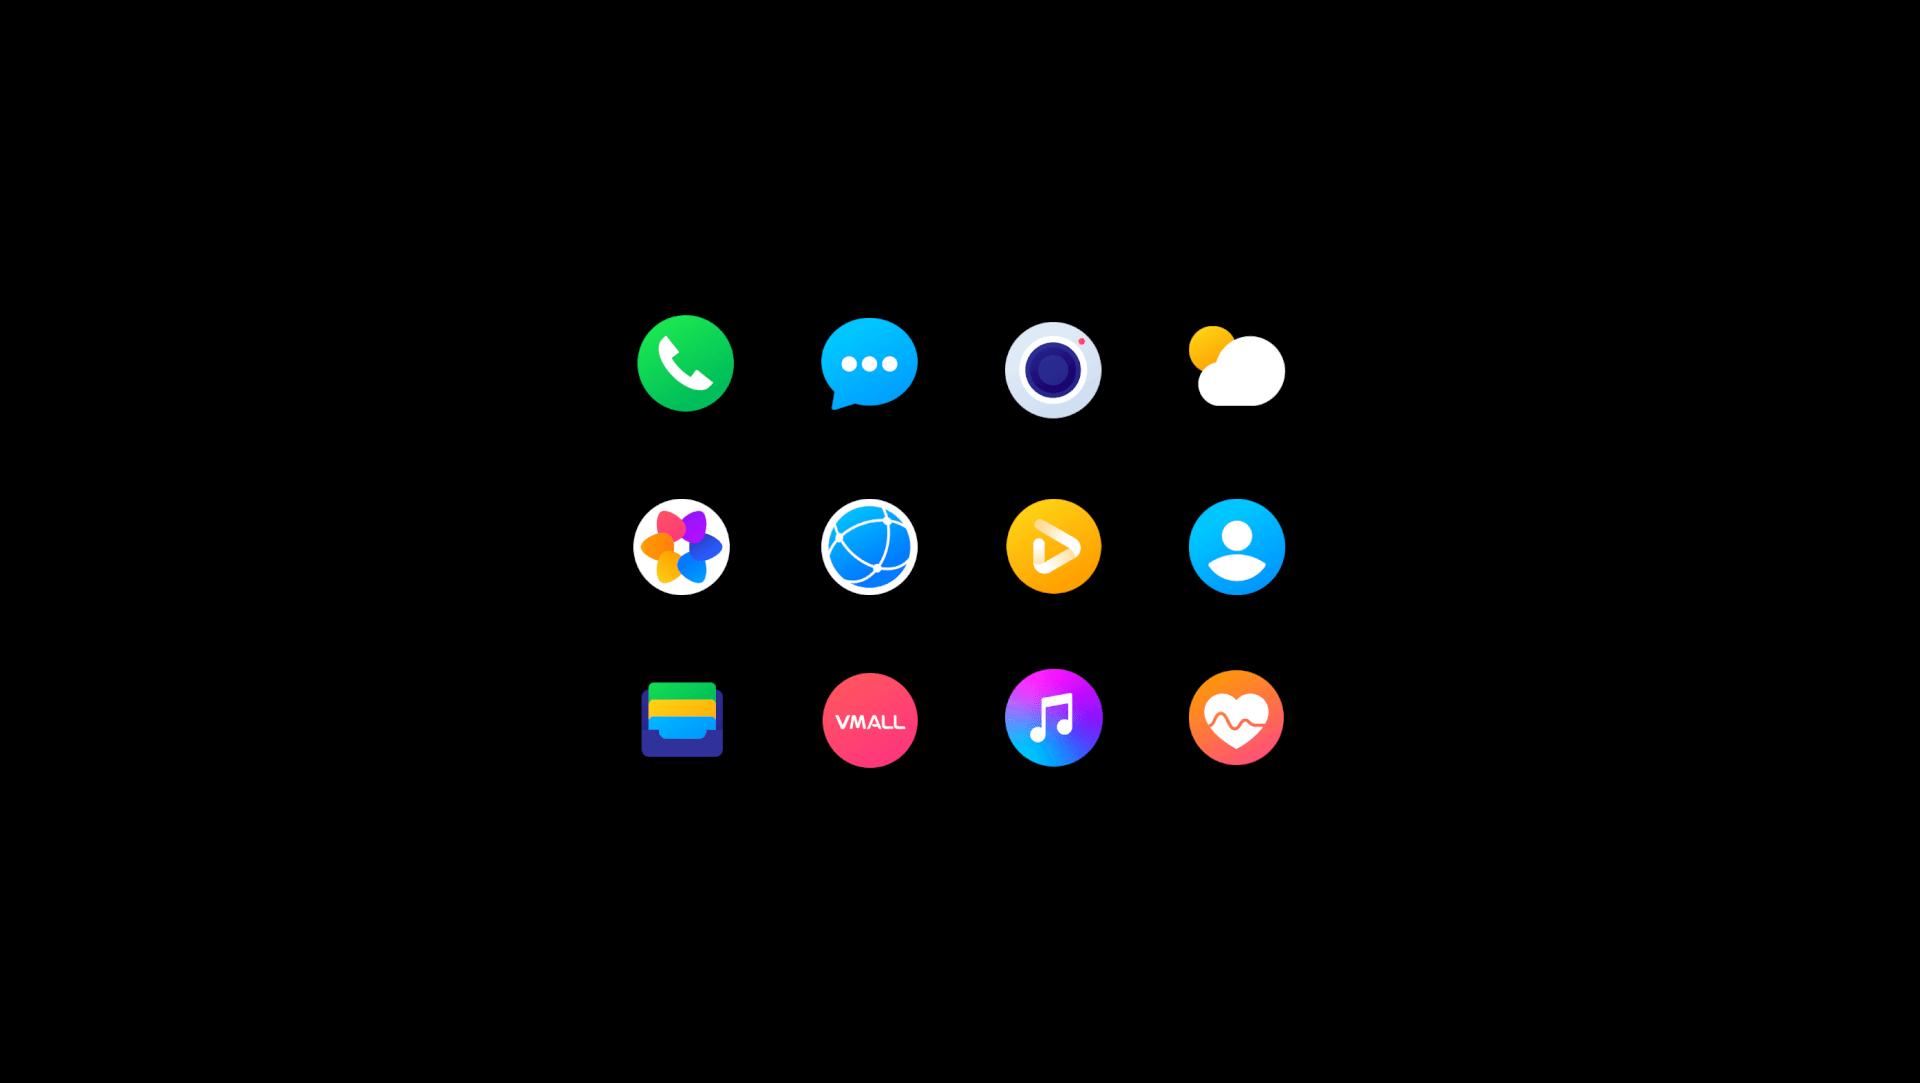 HUAWEI_EMUI_icons_tubik graphic design